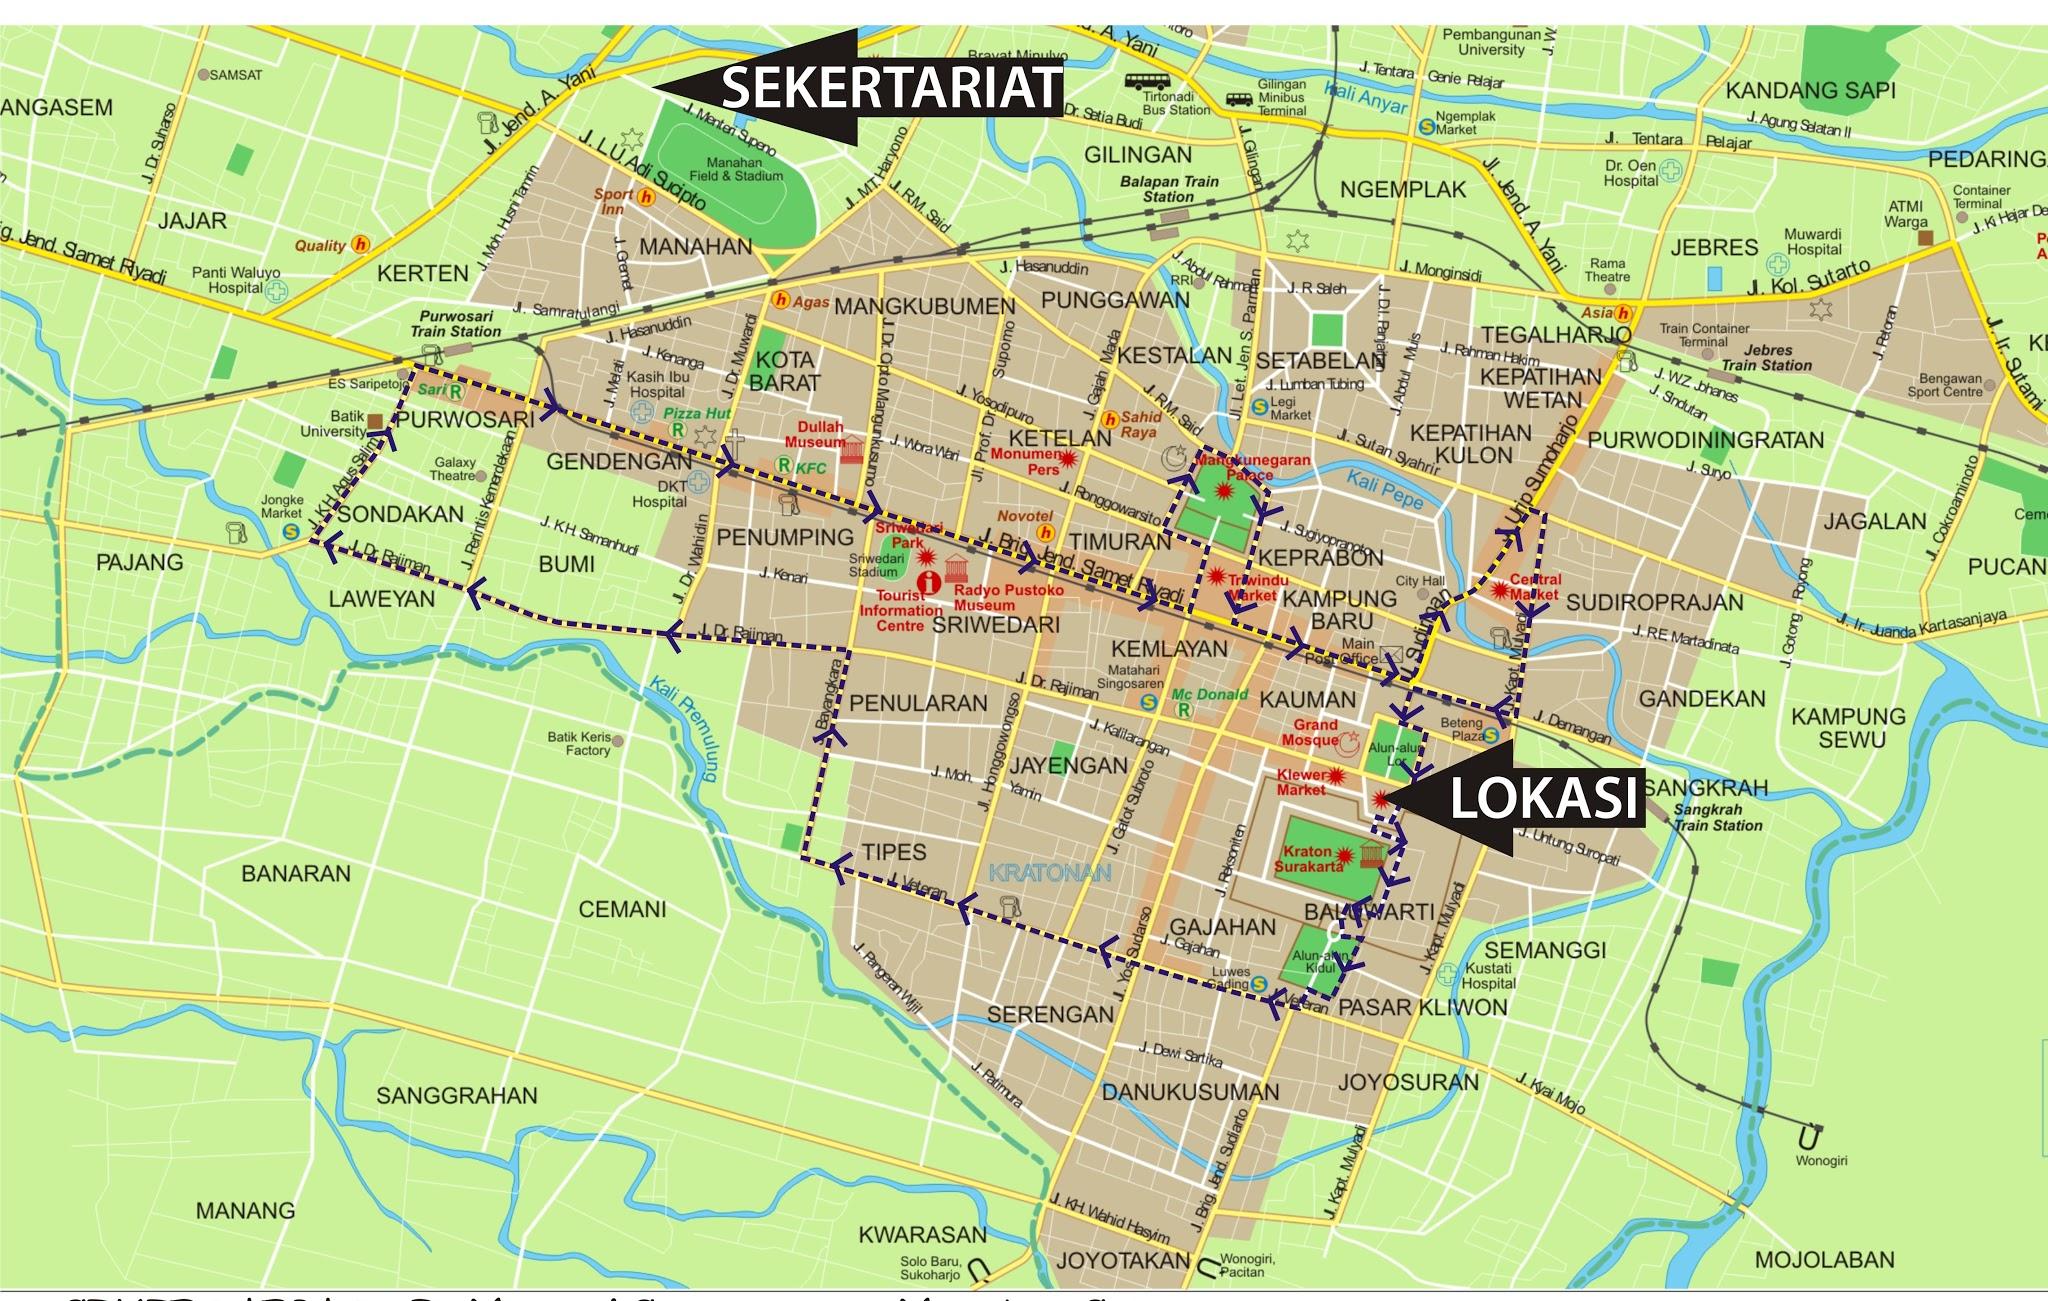 Peta Kota: Peta Kota Solo